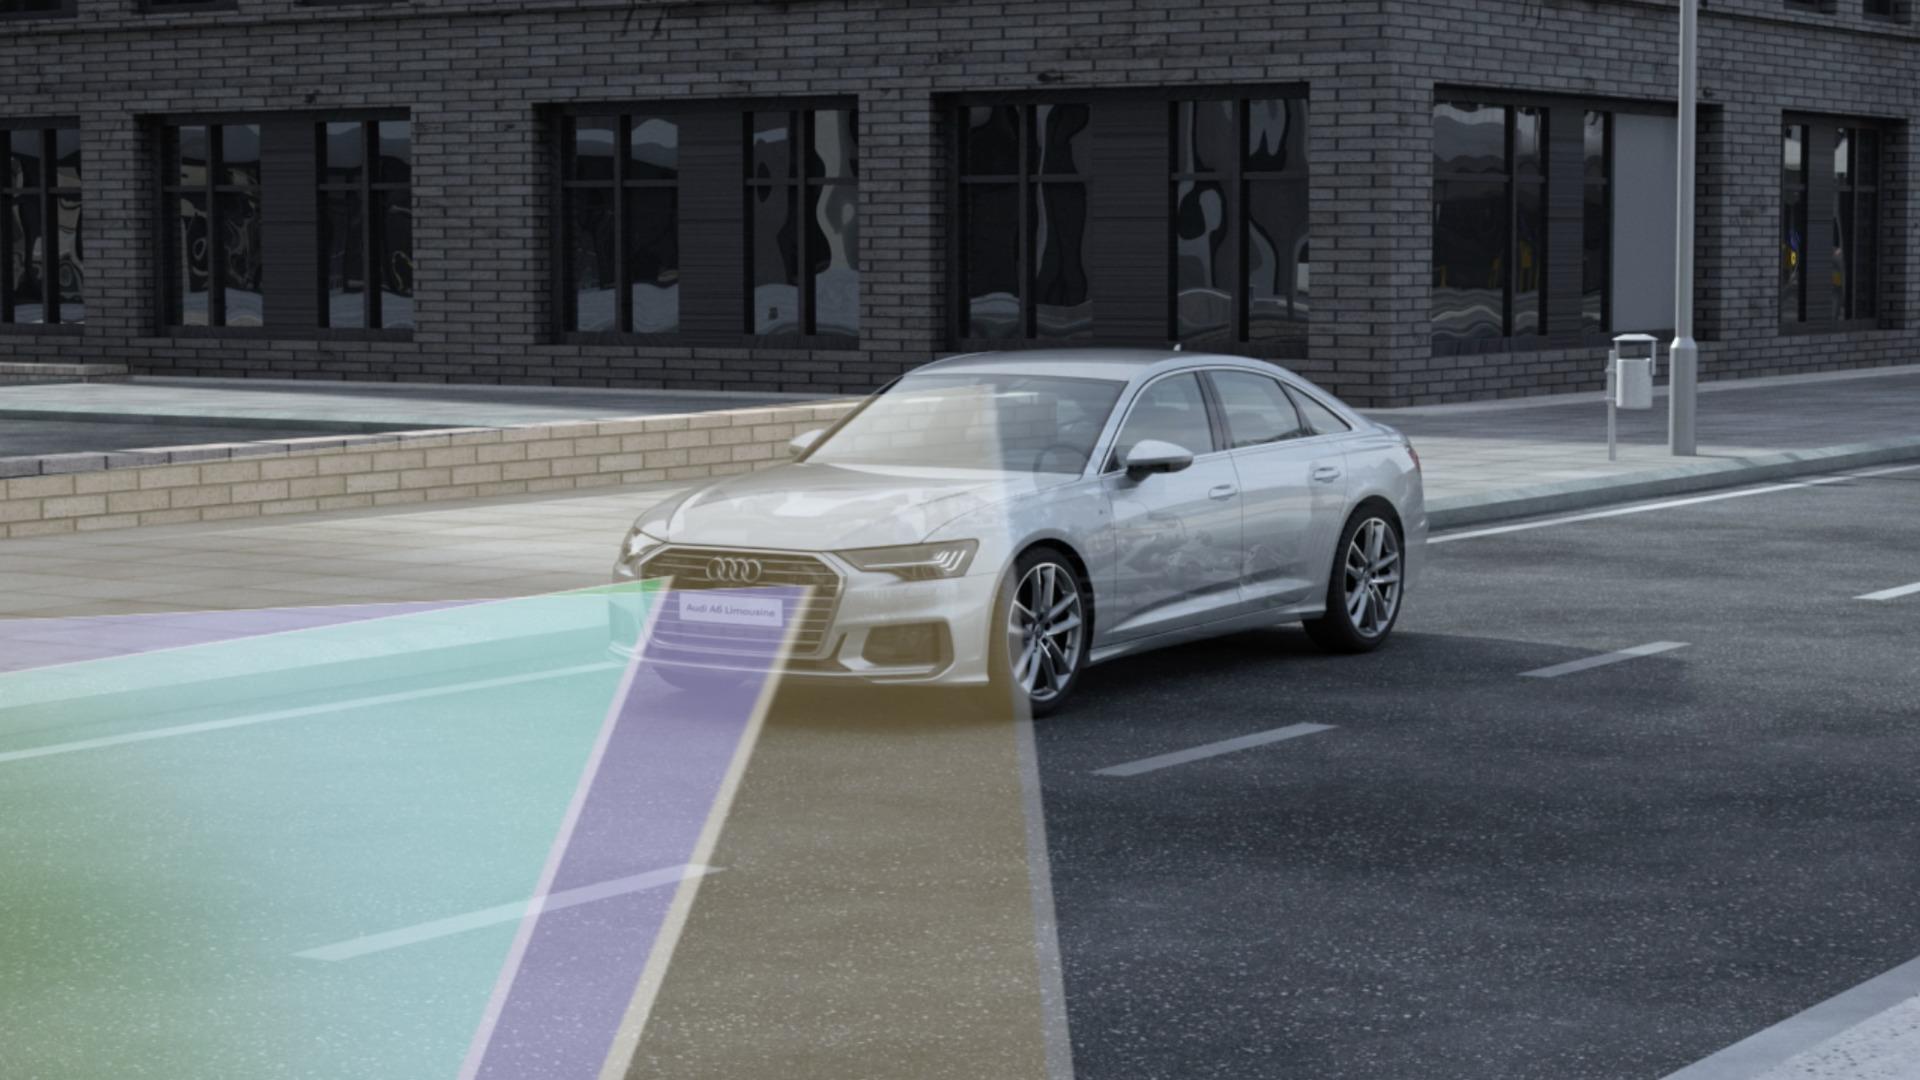 Animation Audi A6 48V Mild-Hybrid-System